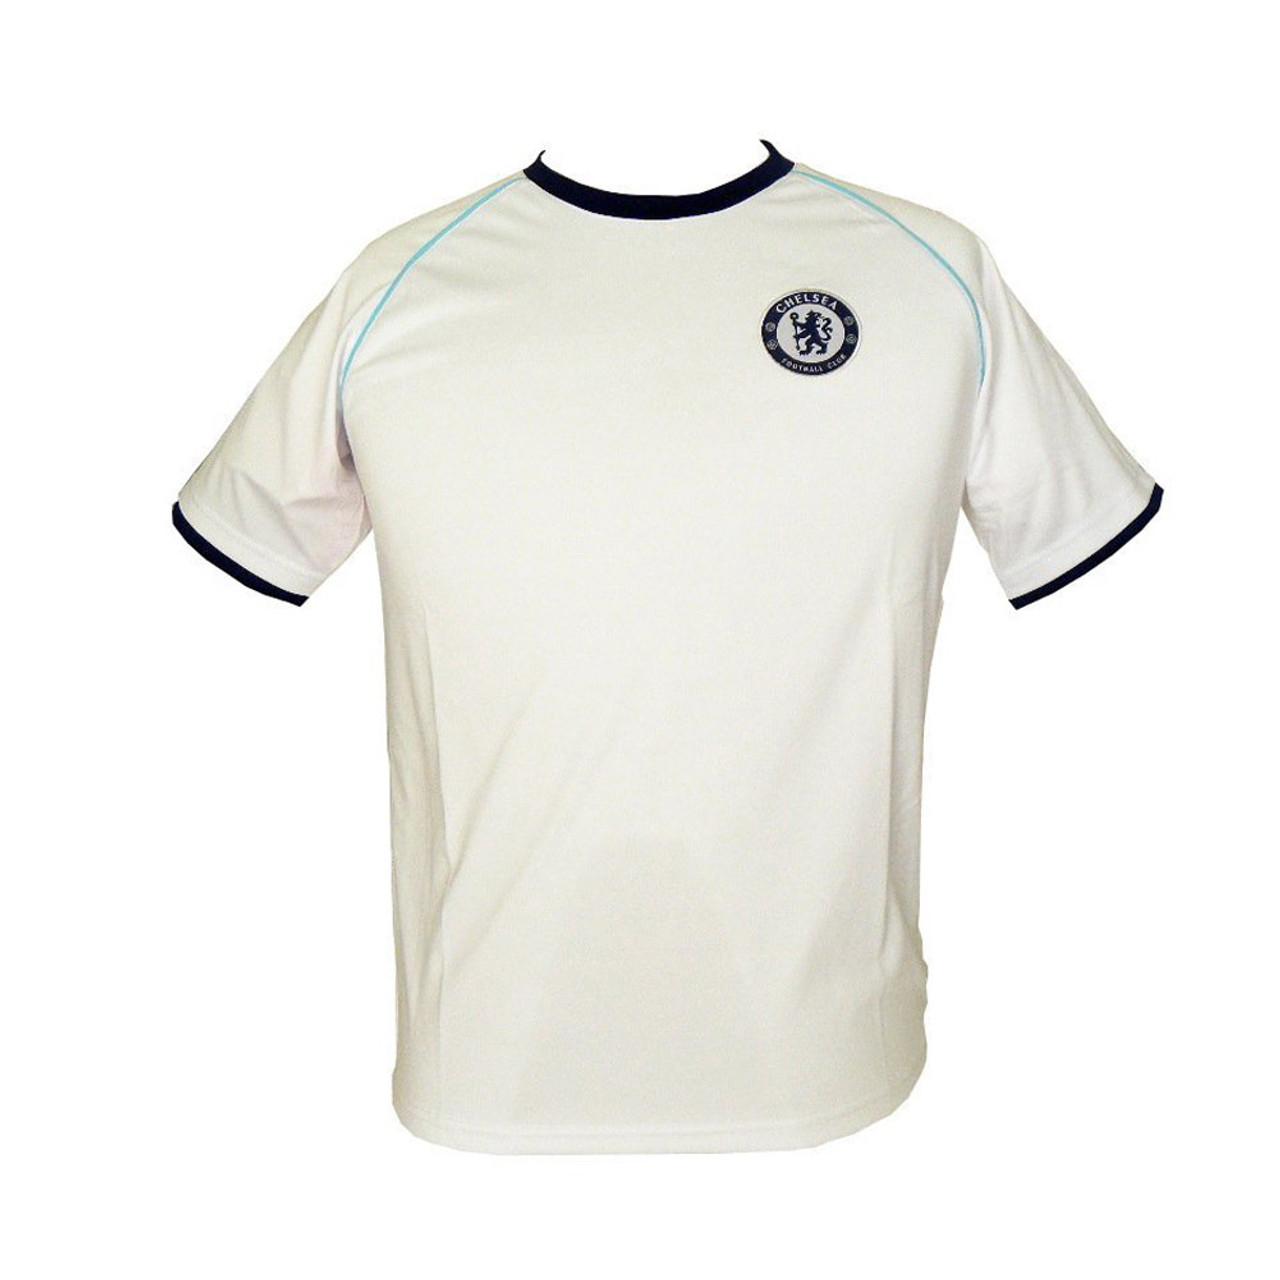 best service 6874a d6613 Rhinox Chelsea FC English Football Club Soccer Training Youth Jersey T6H03